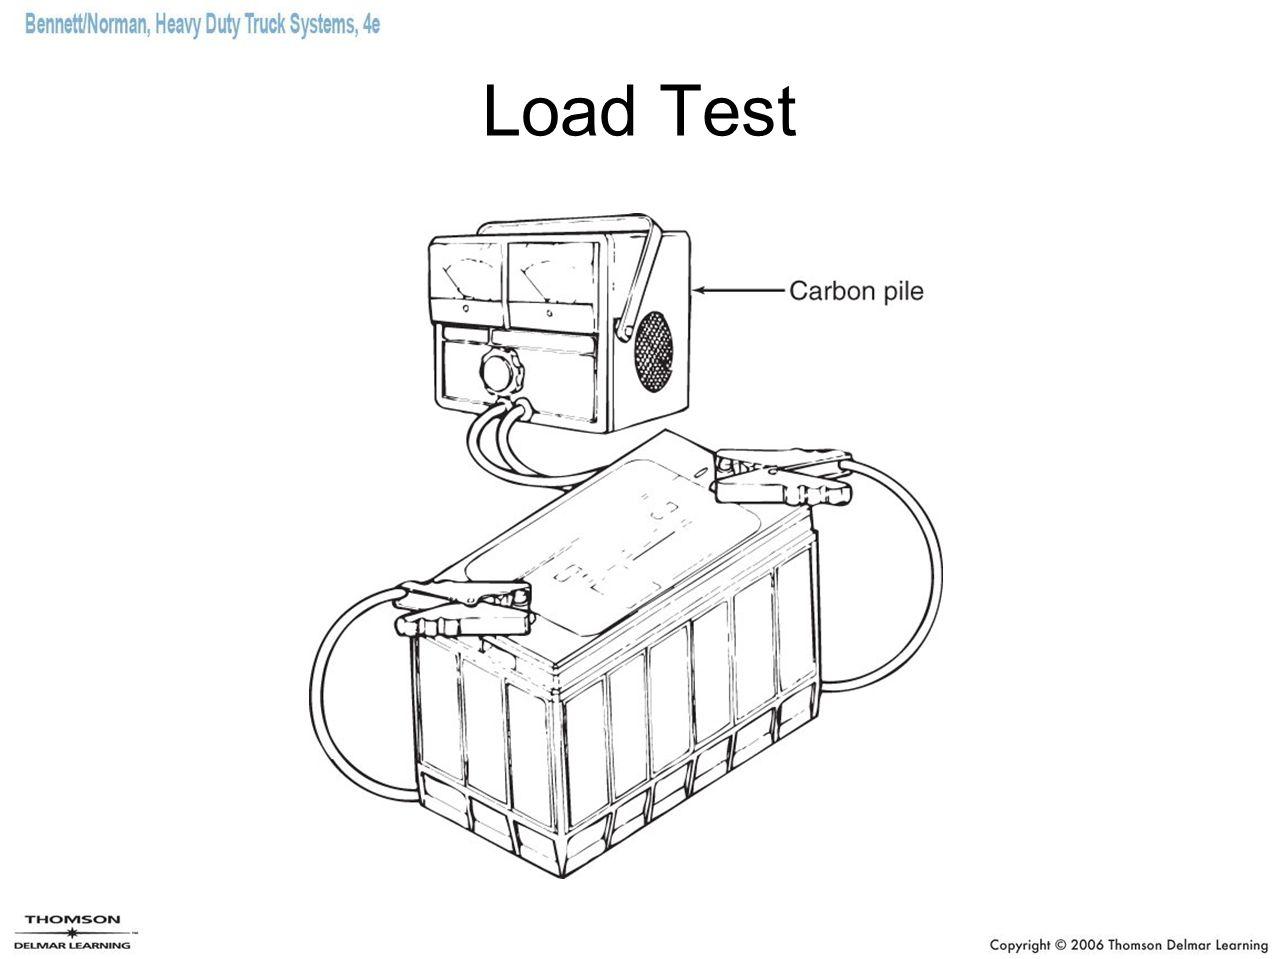 Load Test